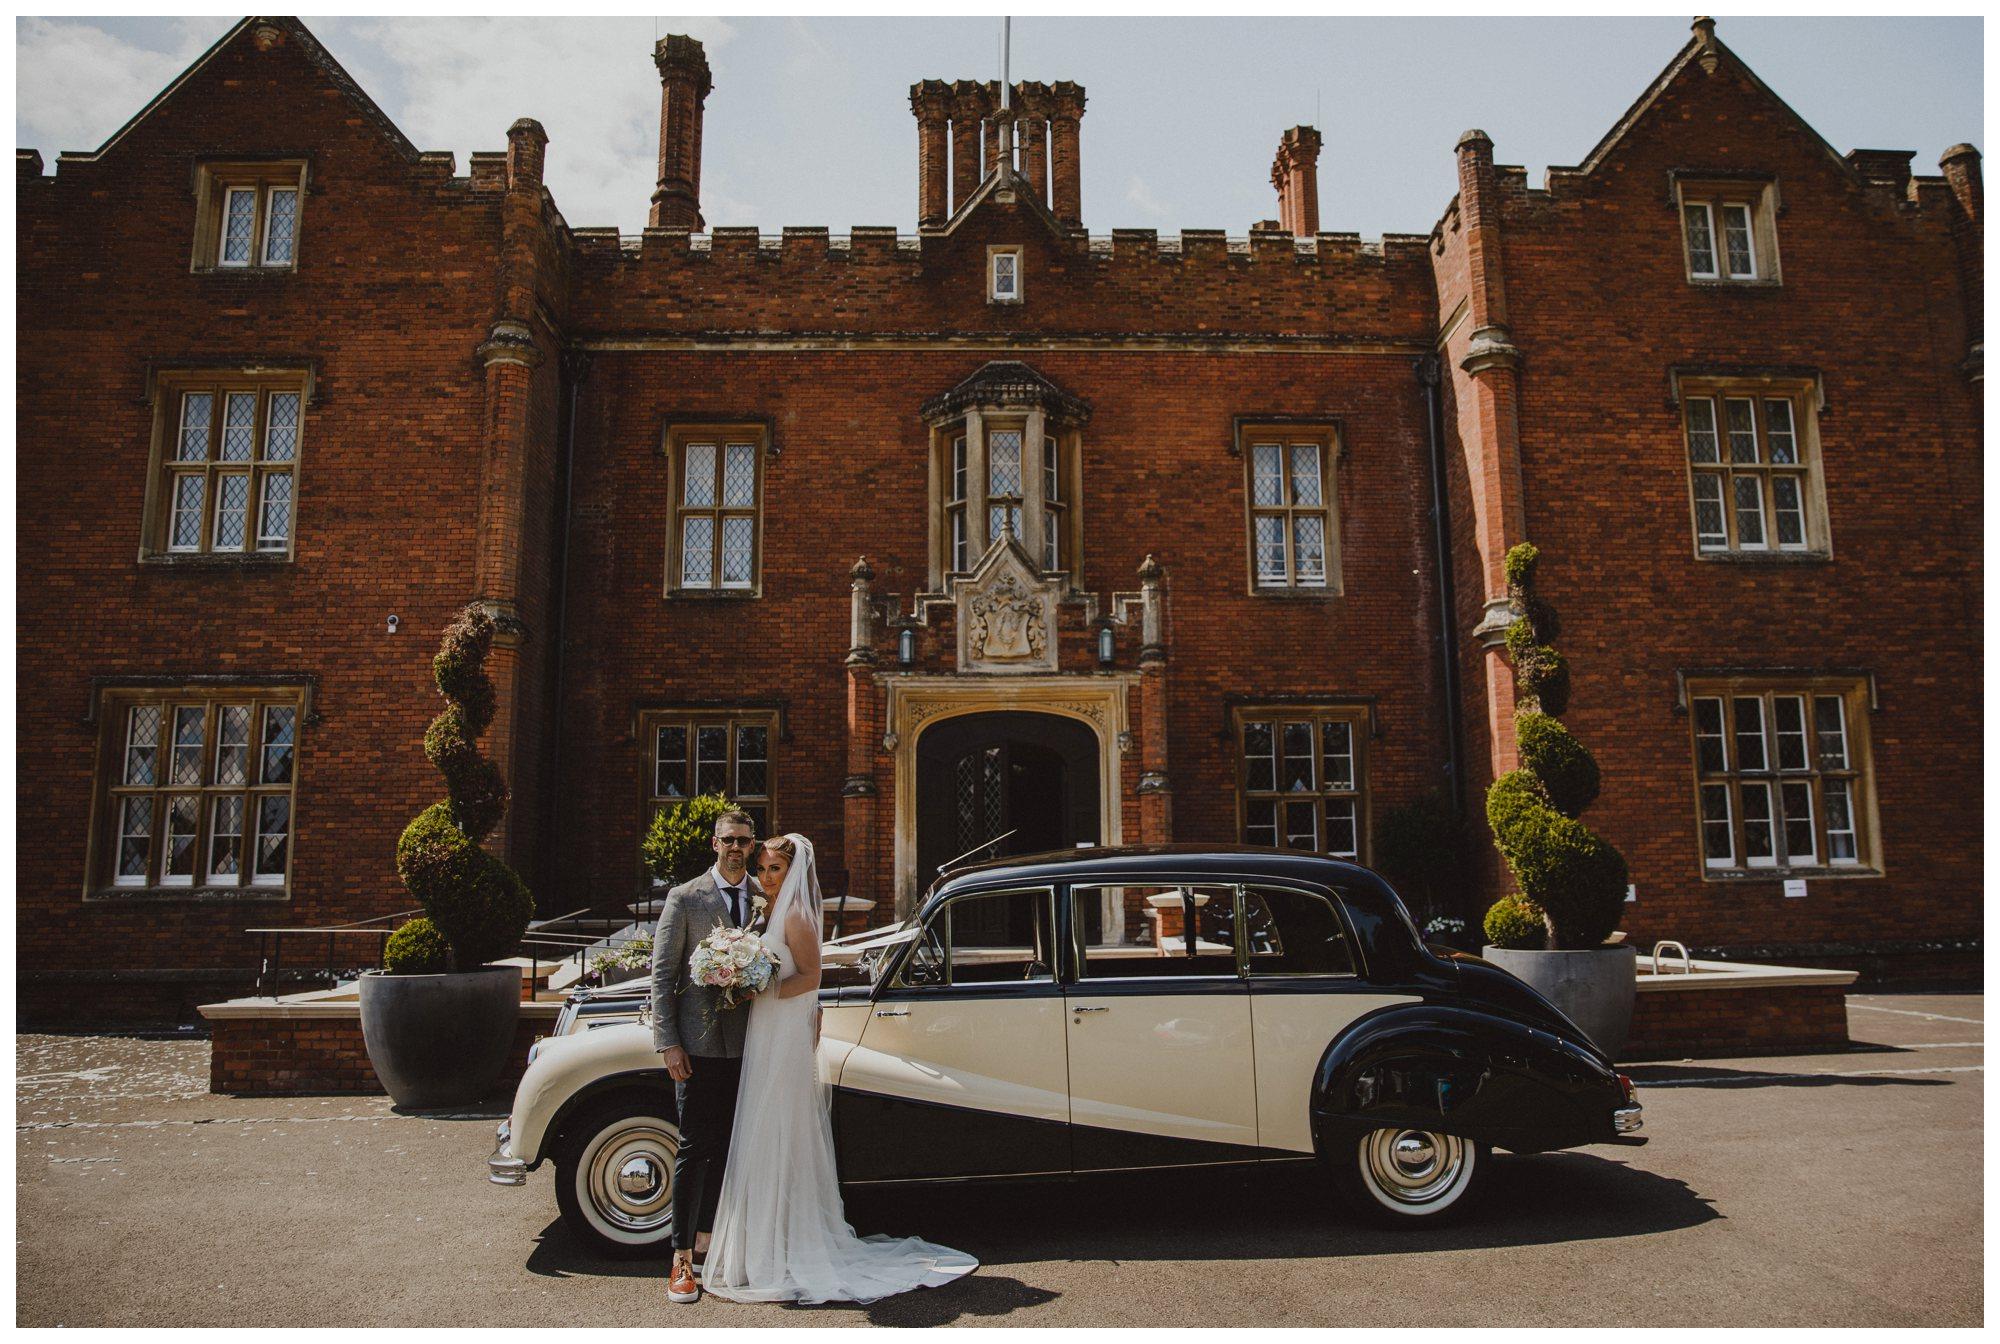 de-vere-latimer-estate-wedding-buckinghamshire_0046.jpg